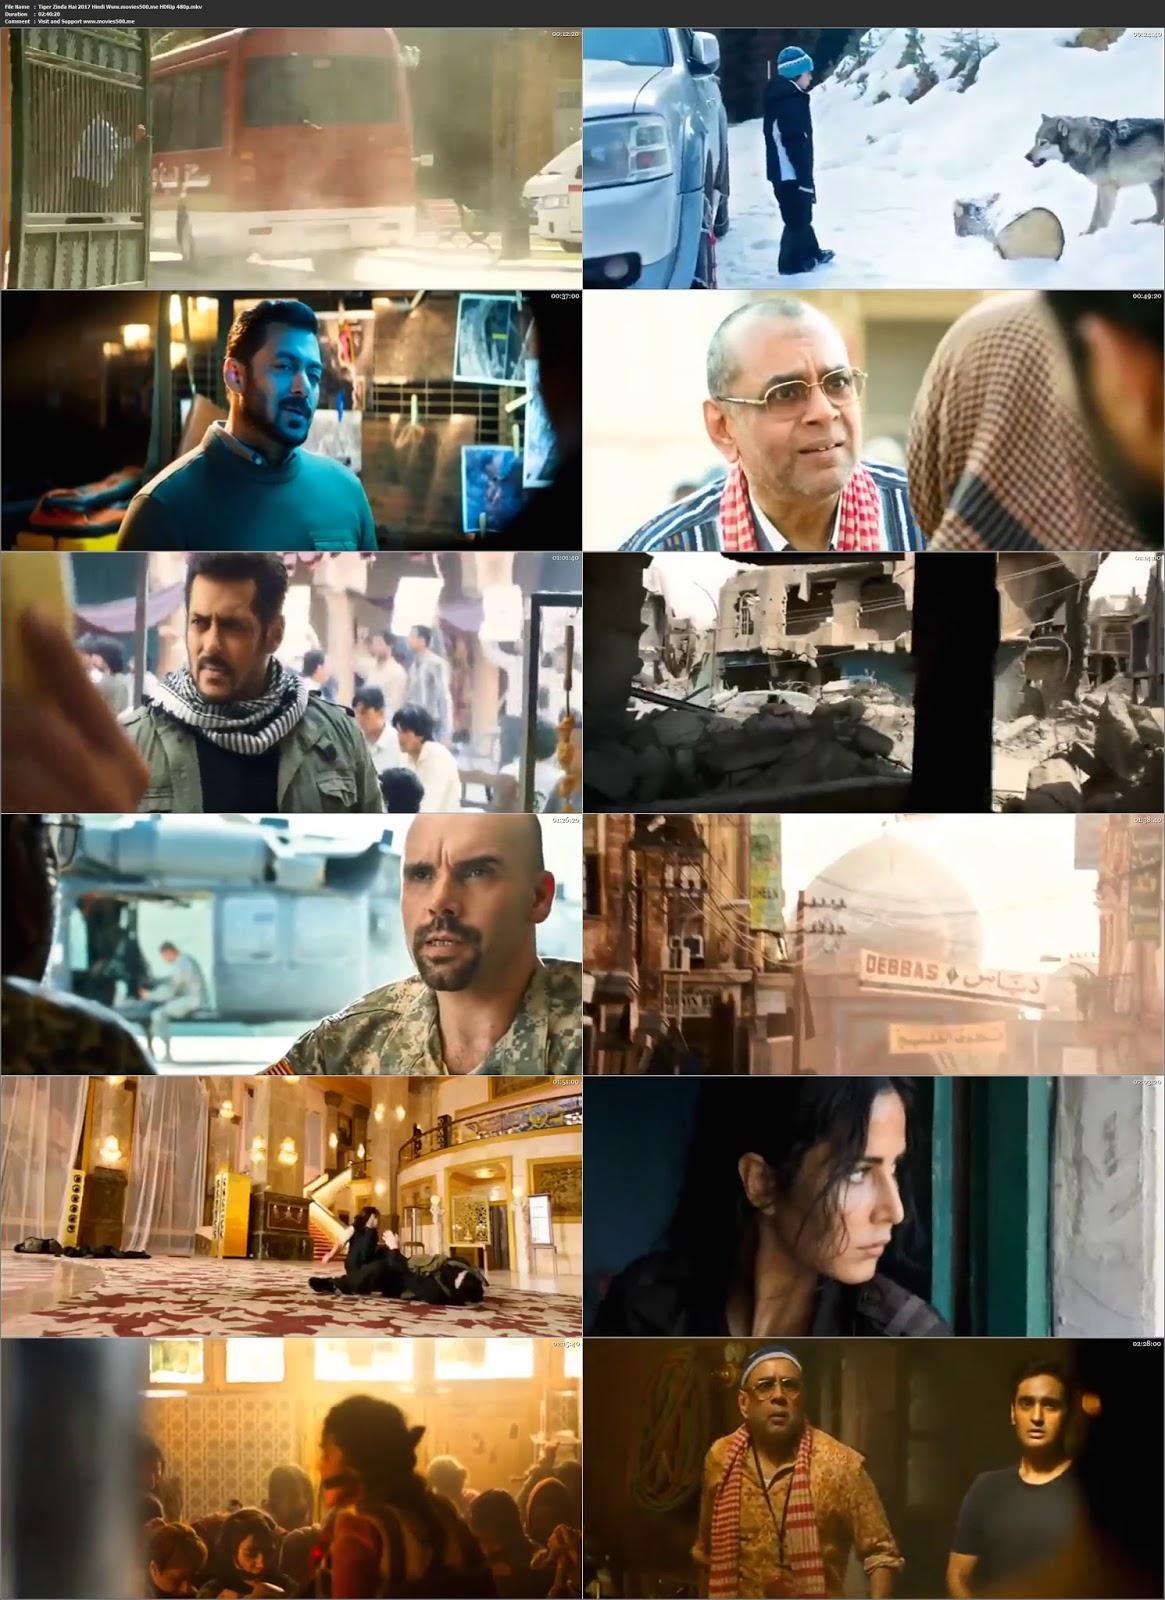 Tiger Zinda Hai 2017 Bollywood 300MB HDRip 480p at newbtcbank.com